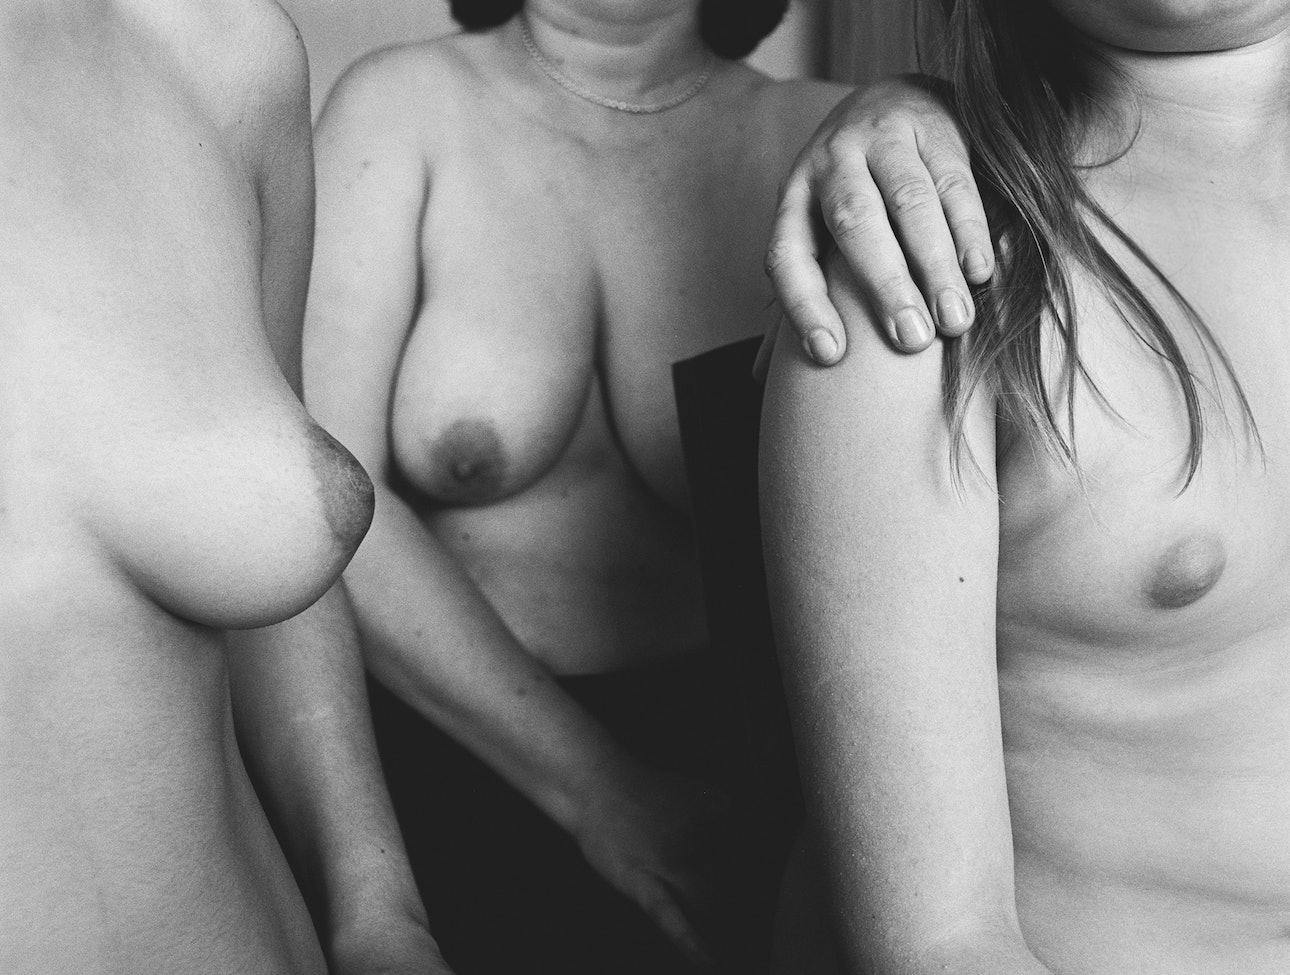 upha-Ani-Zur_Untitled_The_Fertility_project_2010_5